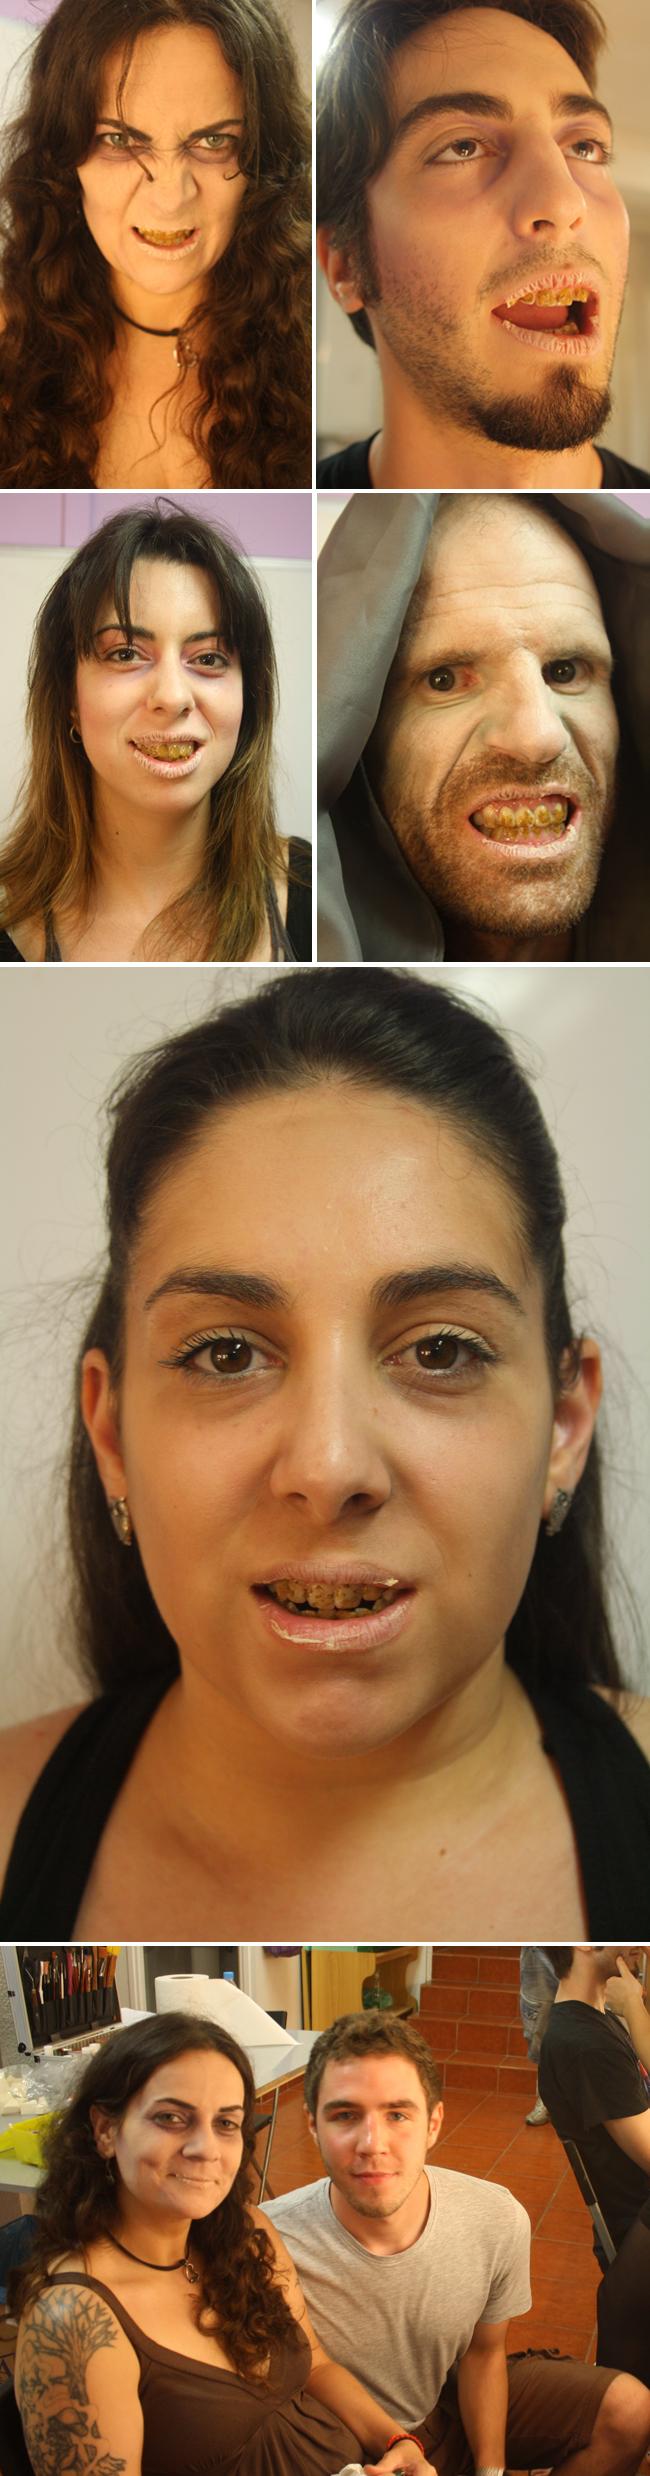 cursos-fx-maquillaje-academiac10-madrid-caracterizacion-cursos-verano-the-walking-dead